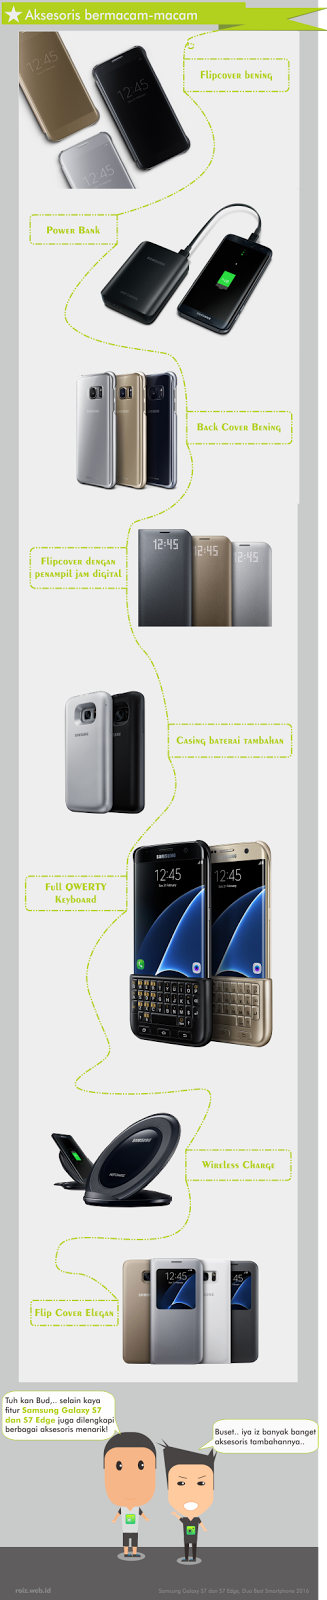 Samsung Galaxy S7 dan S7 Edge, Duo Best Smartphone 2016